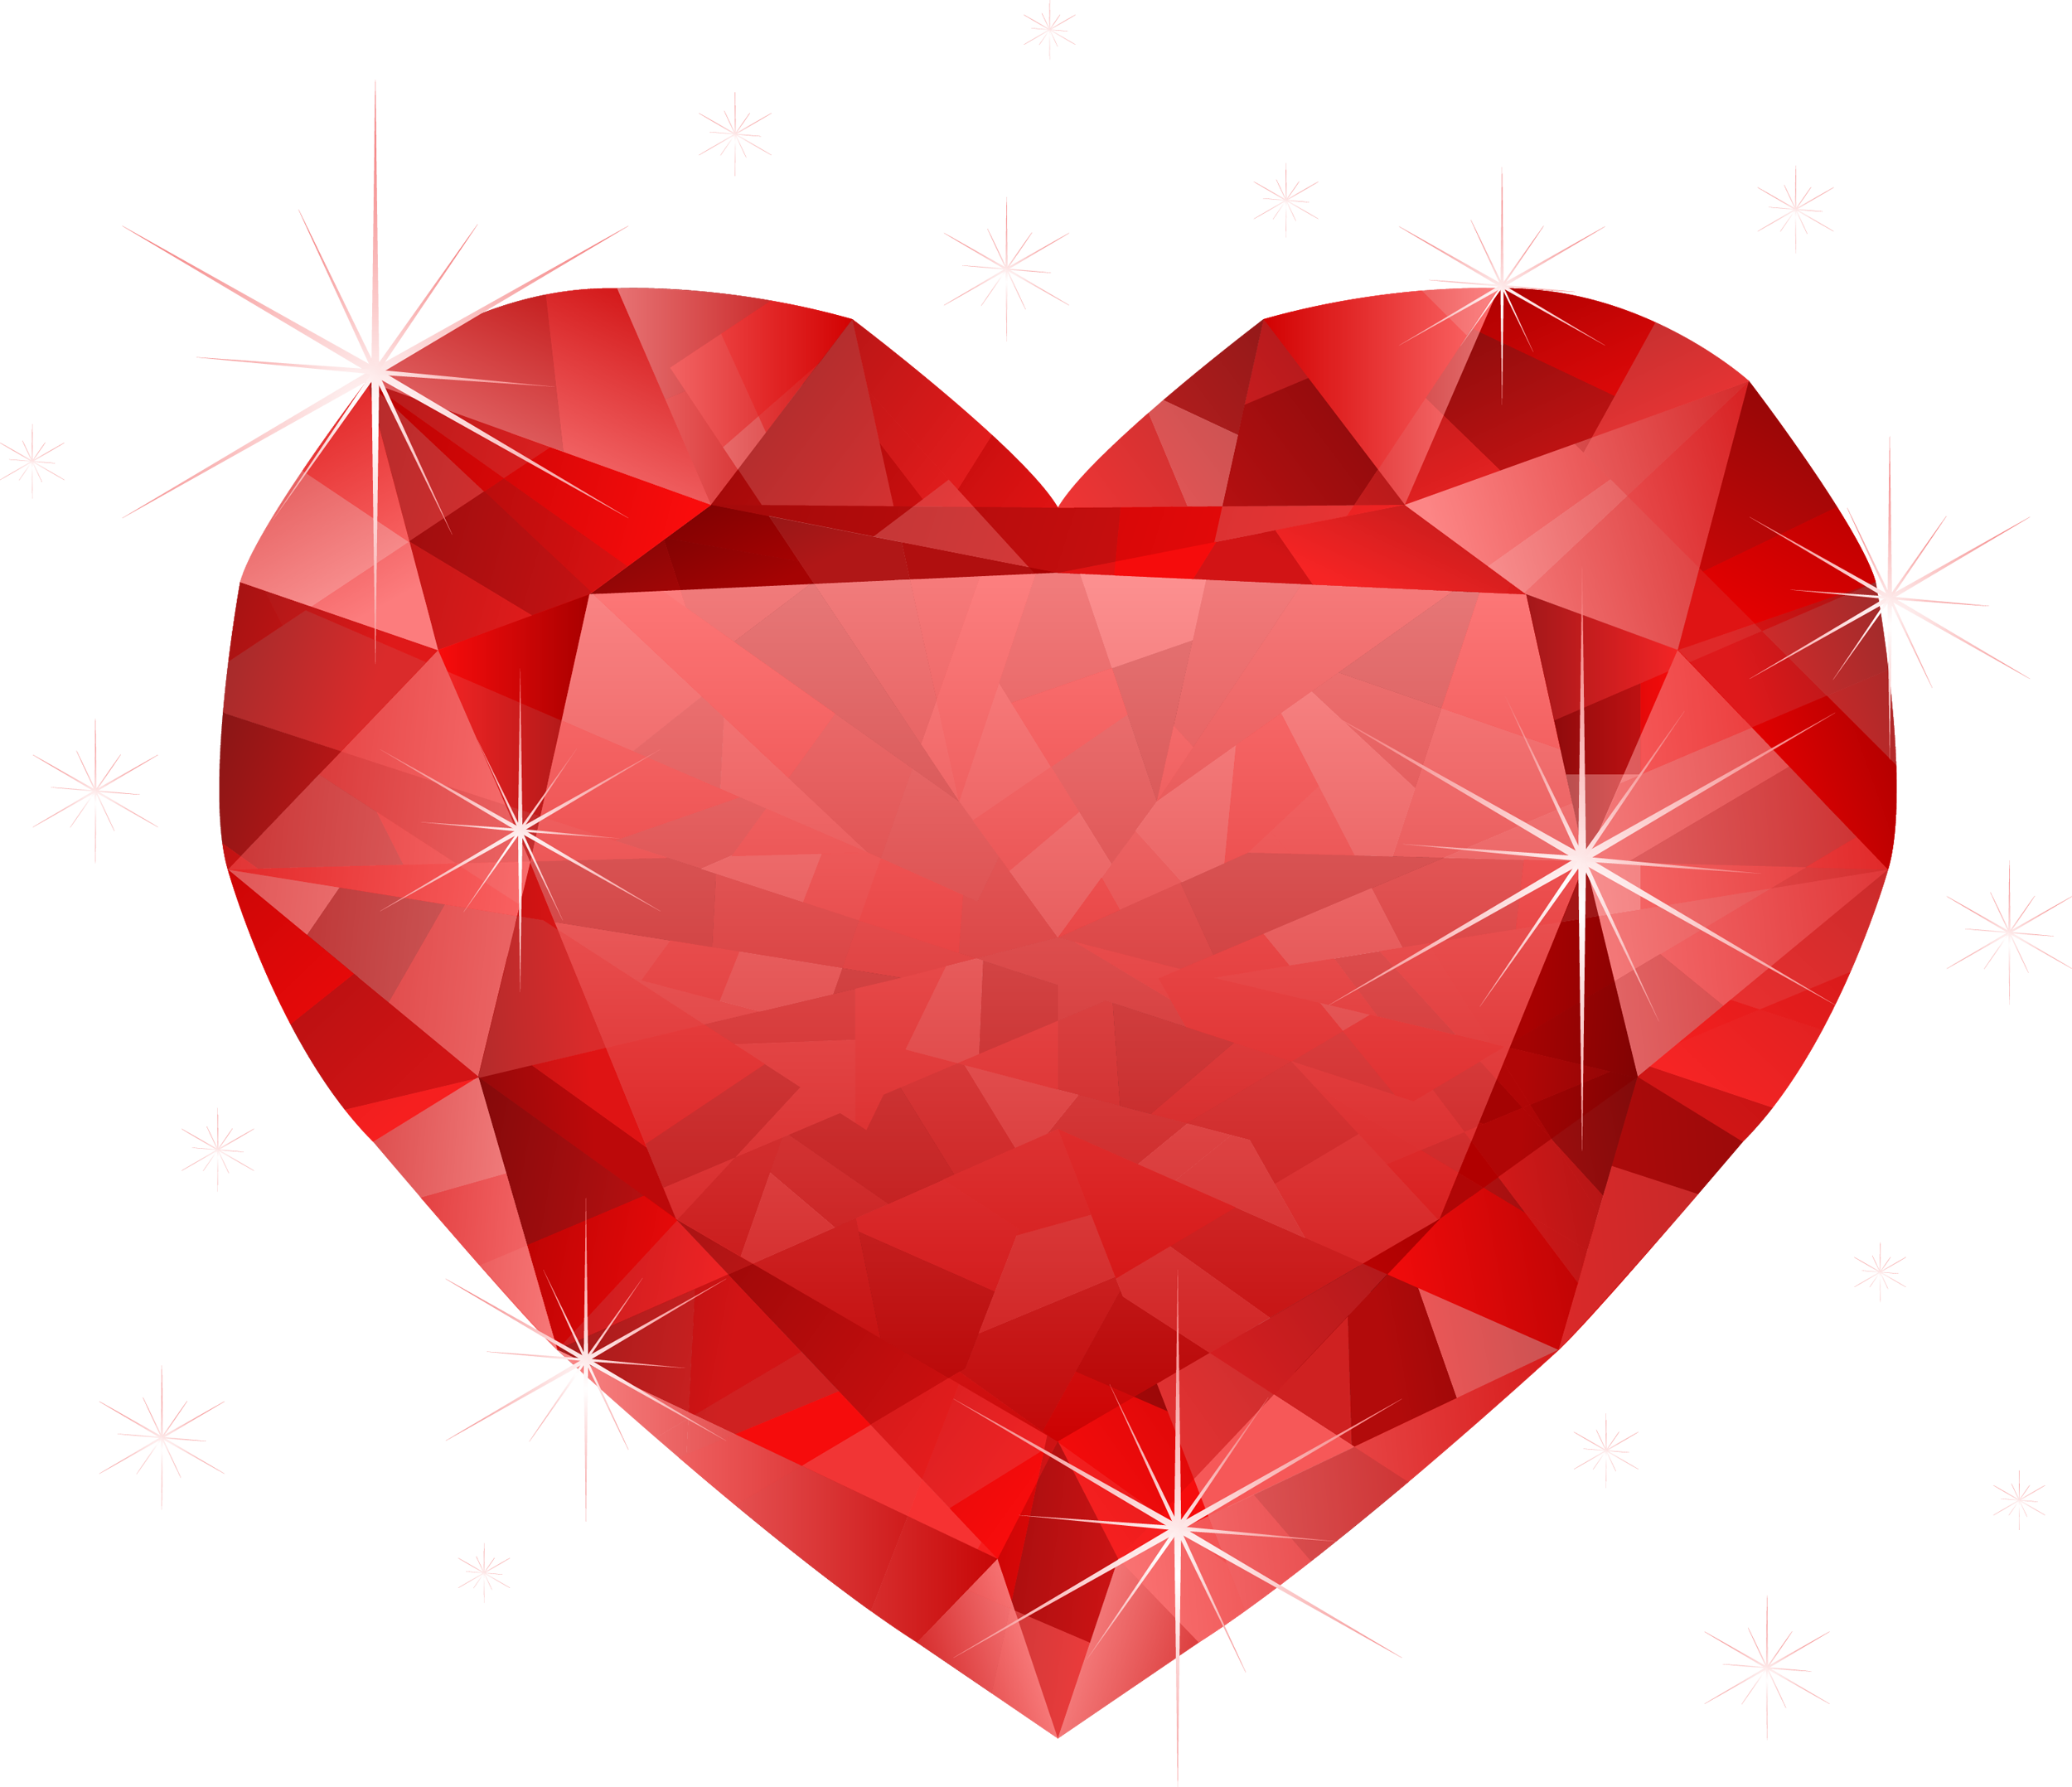 Diamond red heart png diamond red heart png